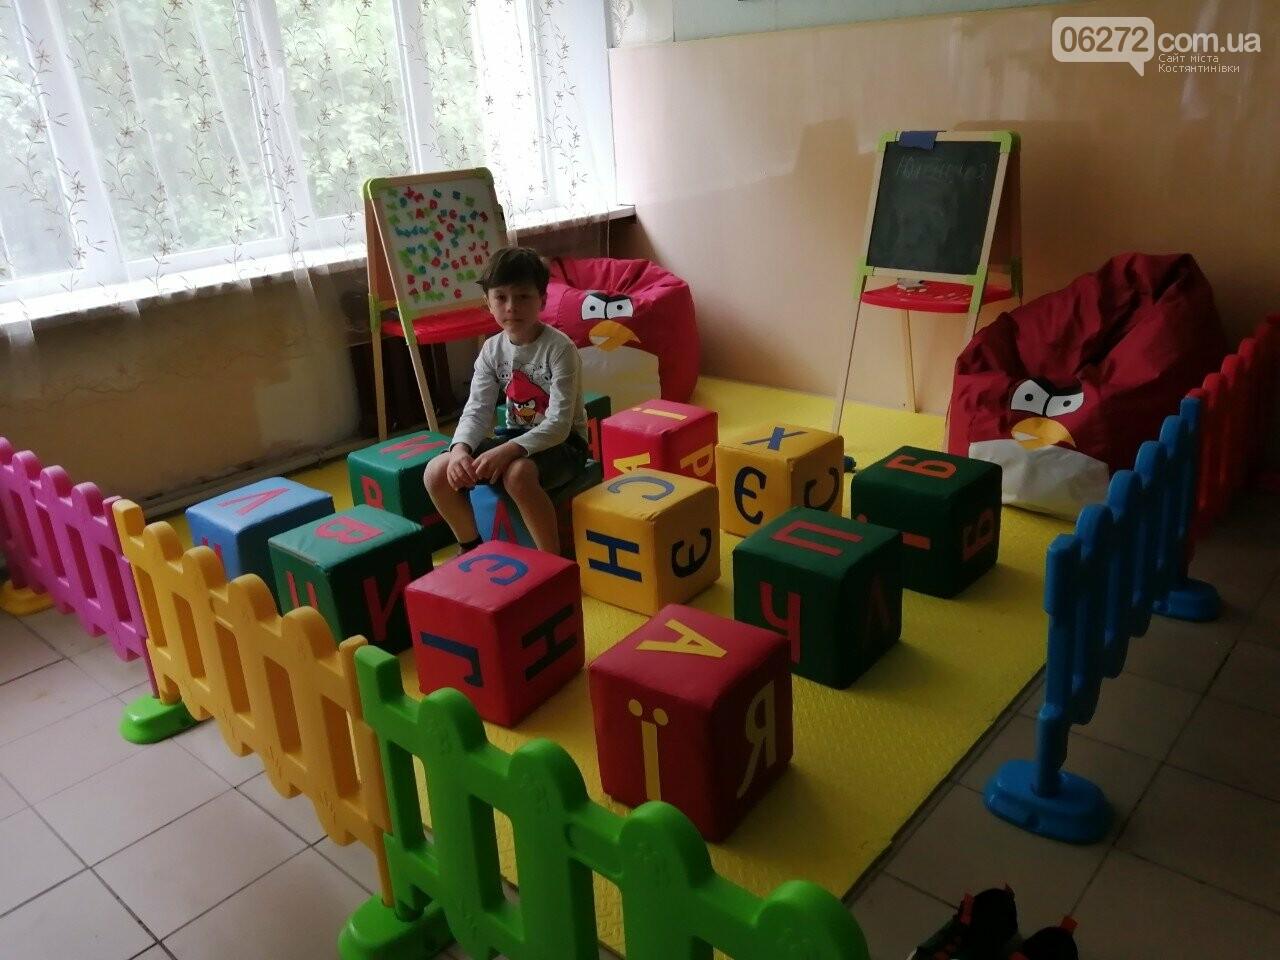 В амбулатории Константиновки установили детскую площадку, фото-1